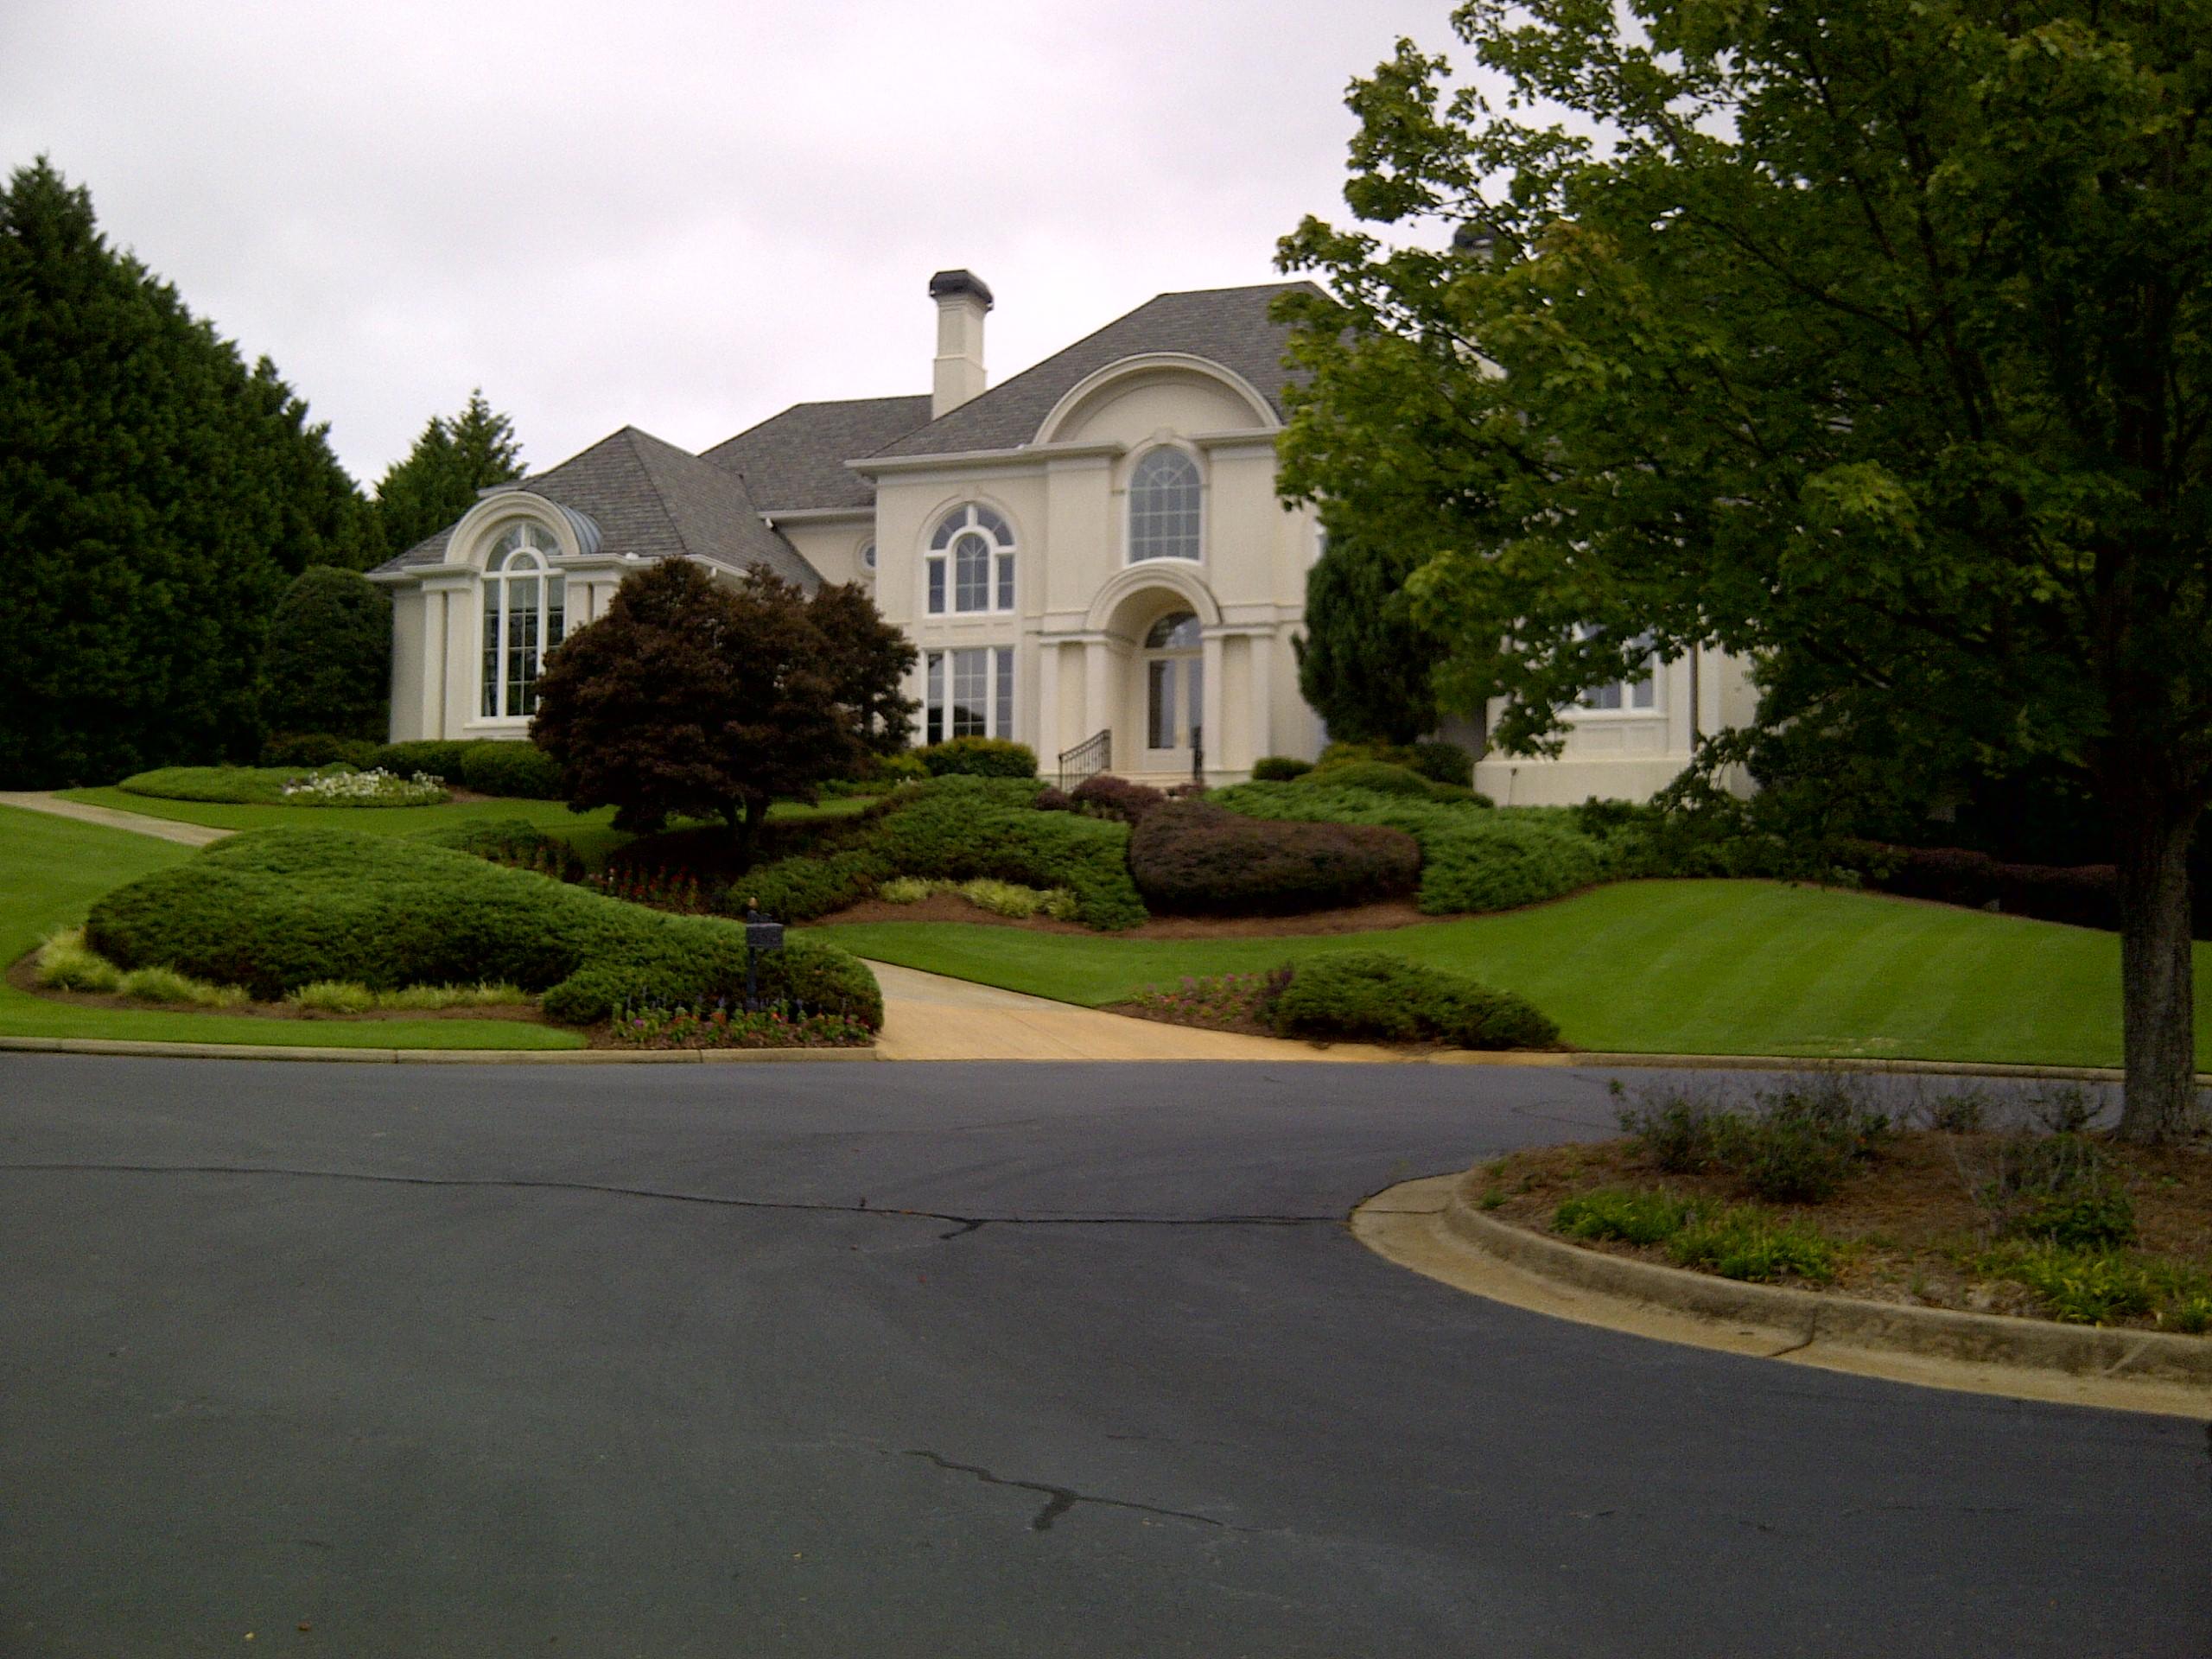 Alpharetta Landscaping, Lawn Care, Landscape Design | Cumming, GA